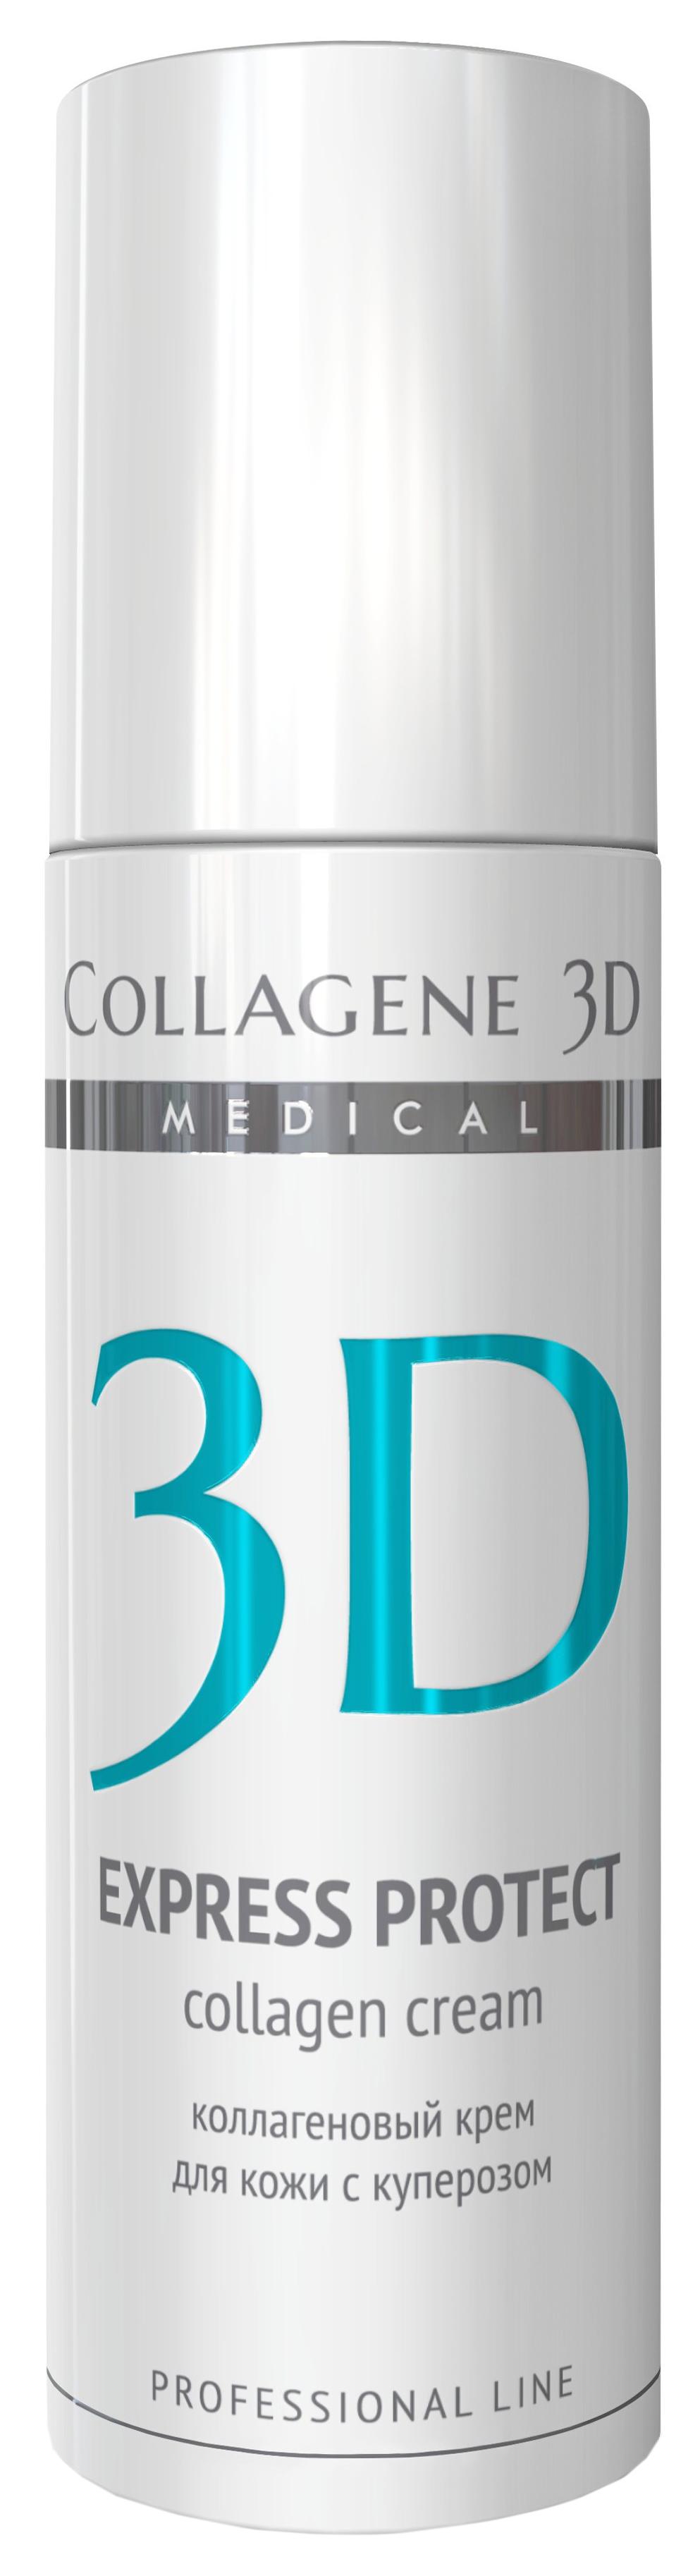 Крем для лица Medical Collagene 3D Exspress Protect 30 мл